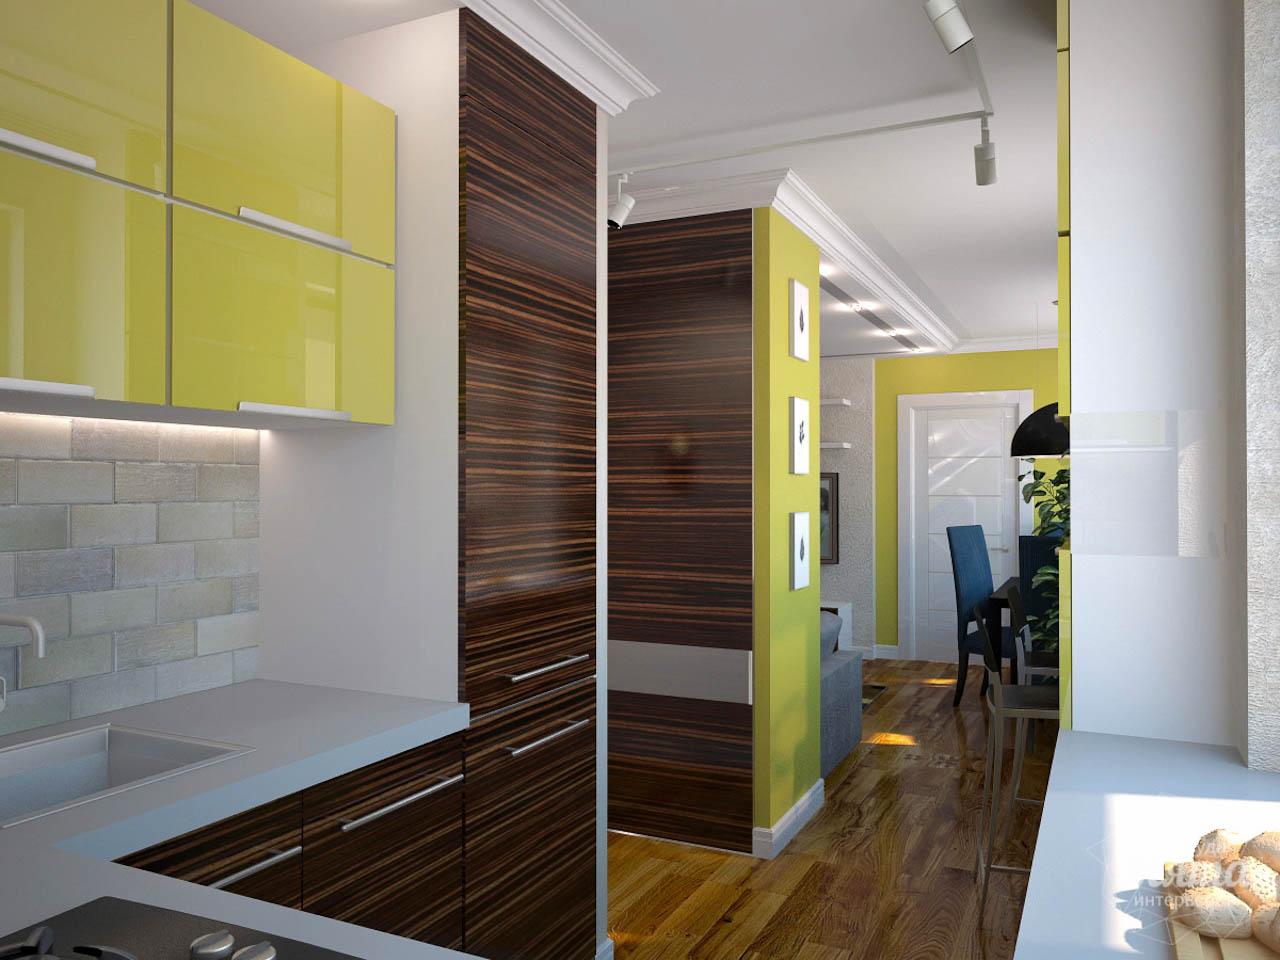 Дизайн интерьера двухкомнатной квартиры по ул. Комсомольская 14 img1941976420